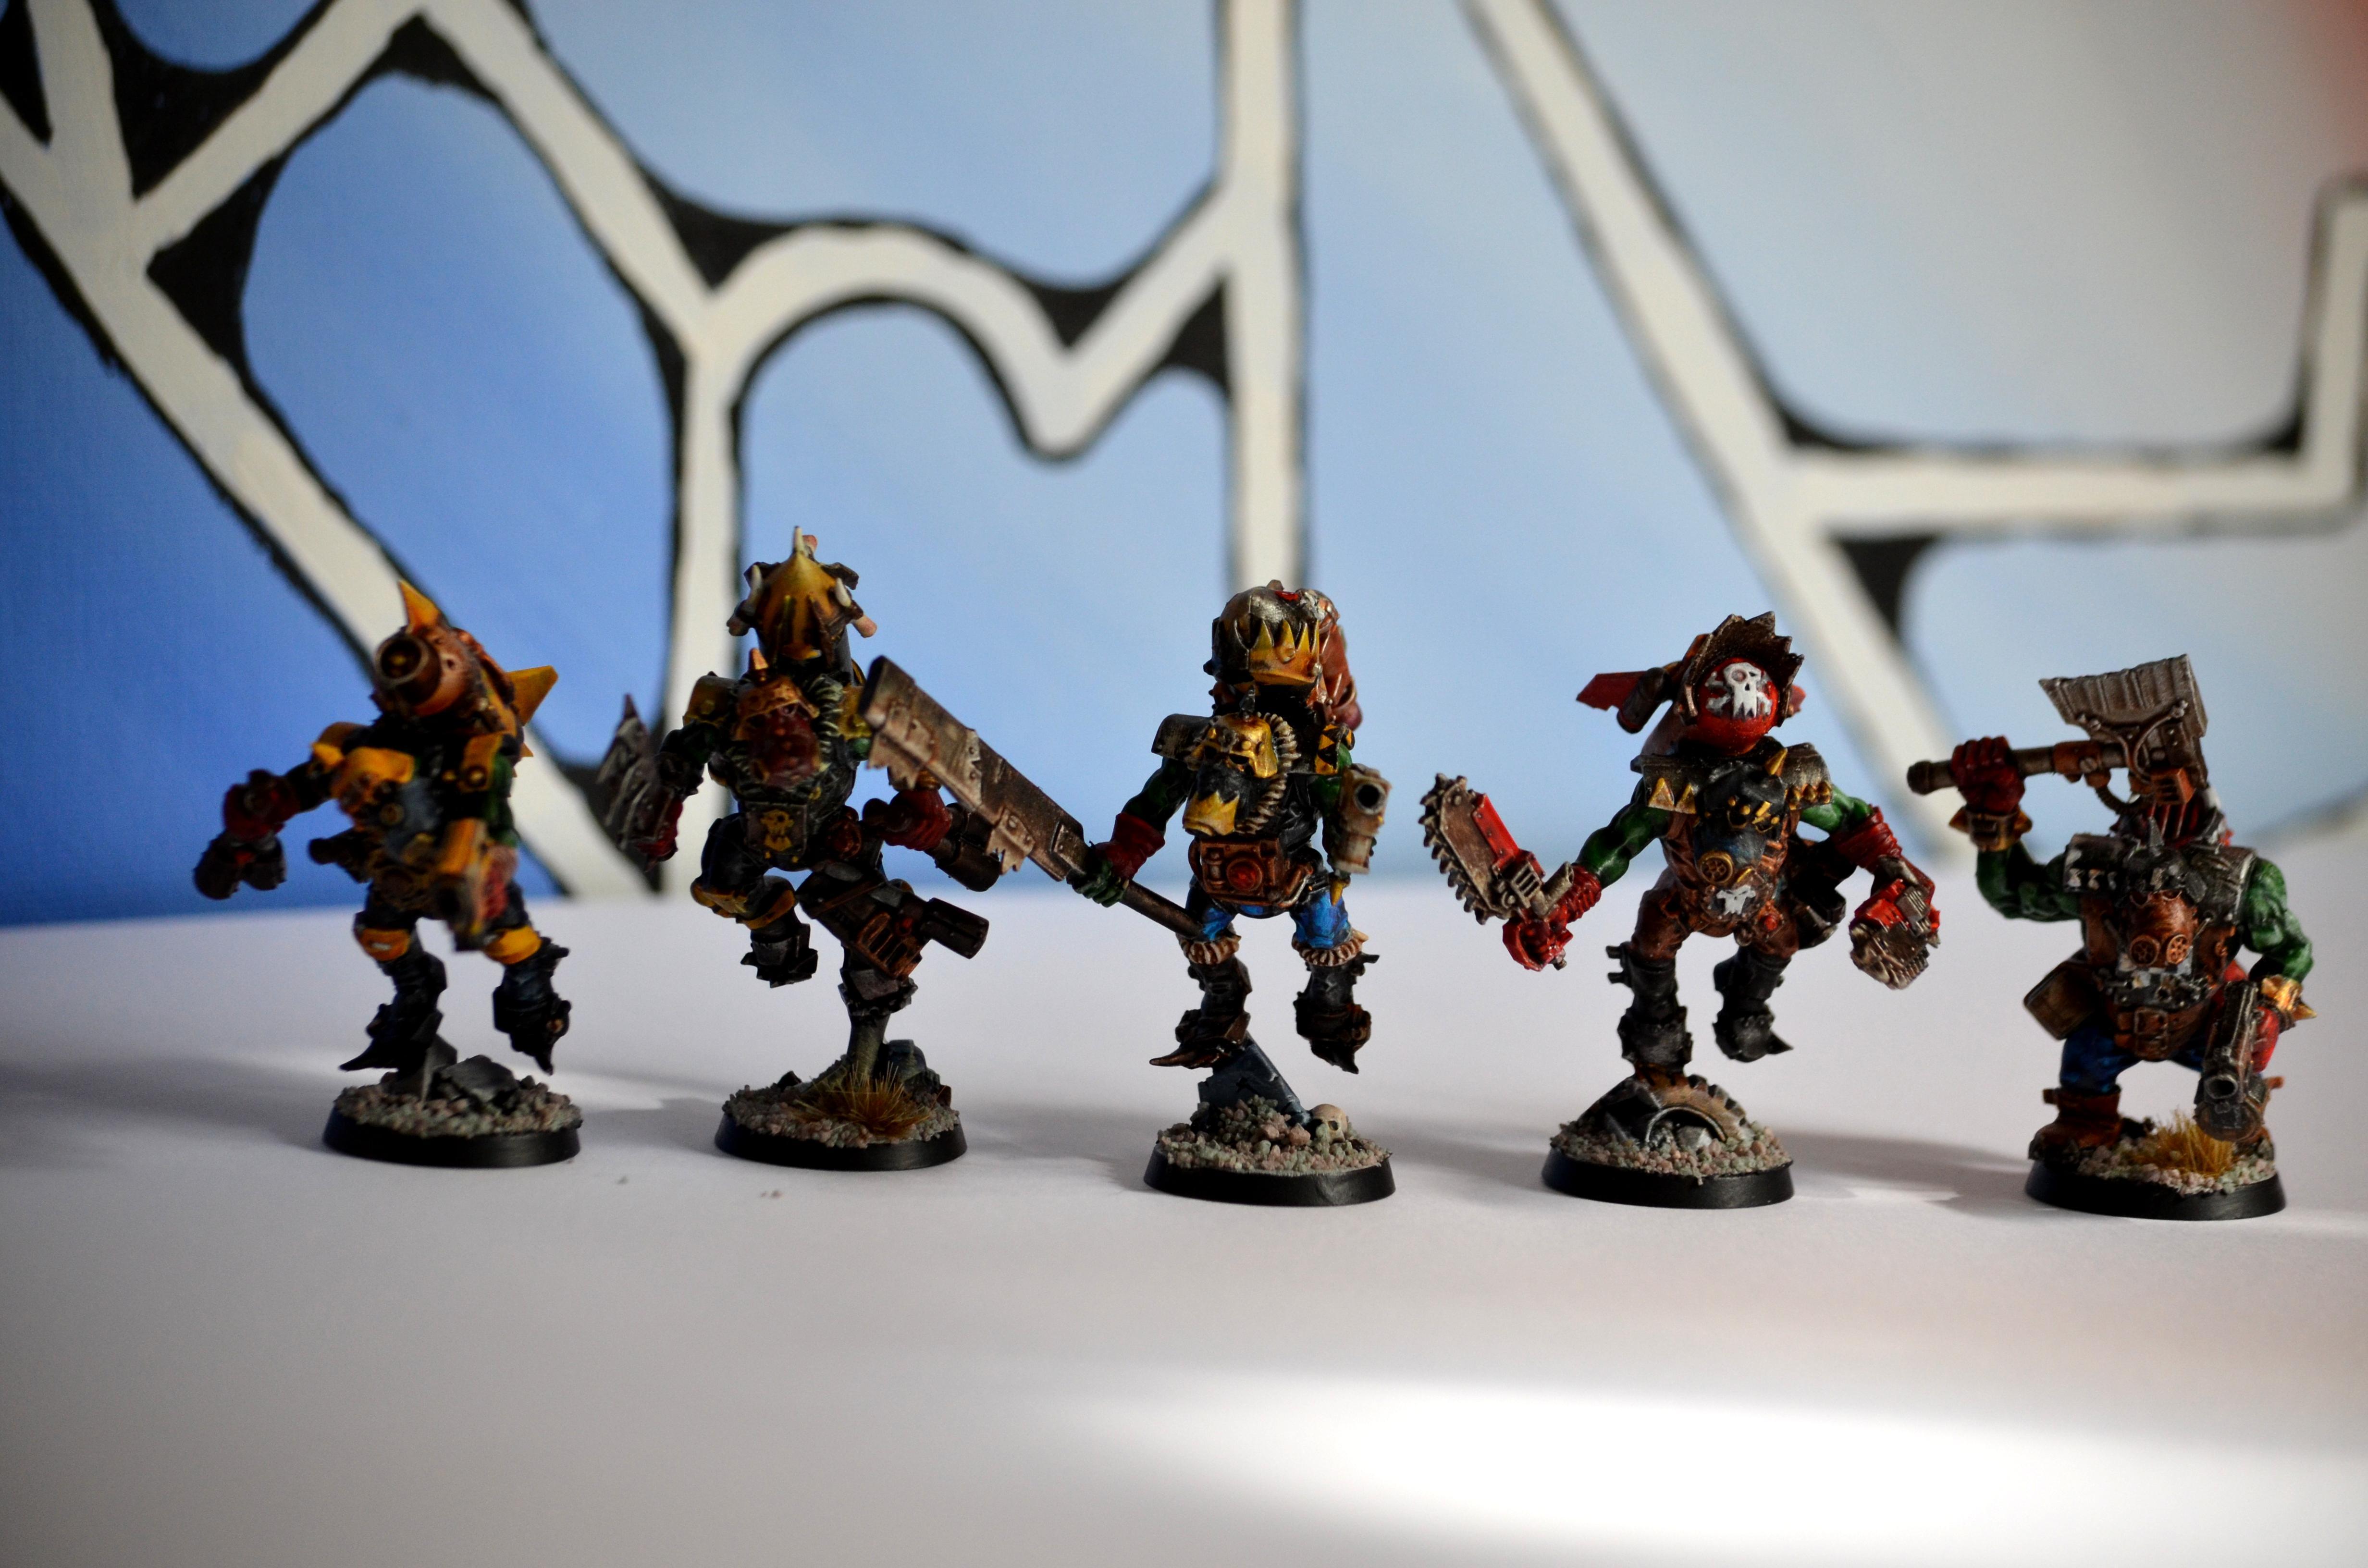 Freebooters, Freebooterz, Orks, Stormboyz